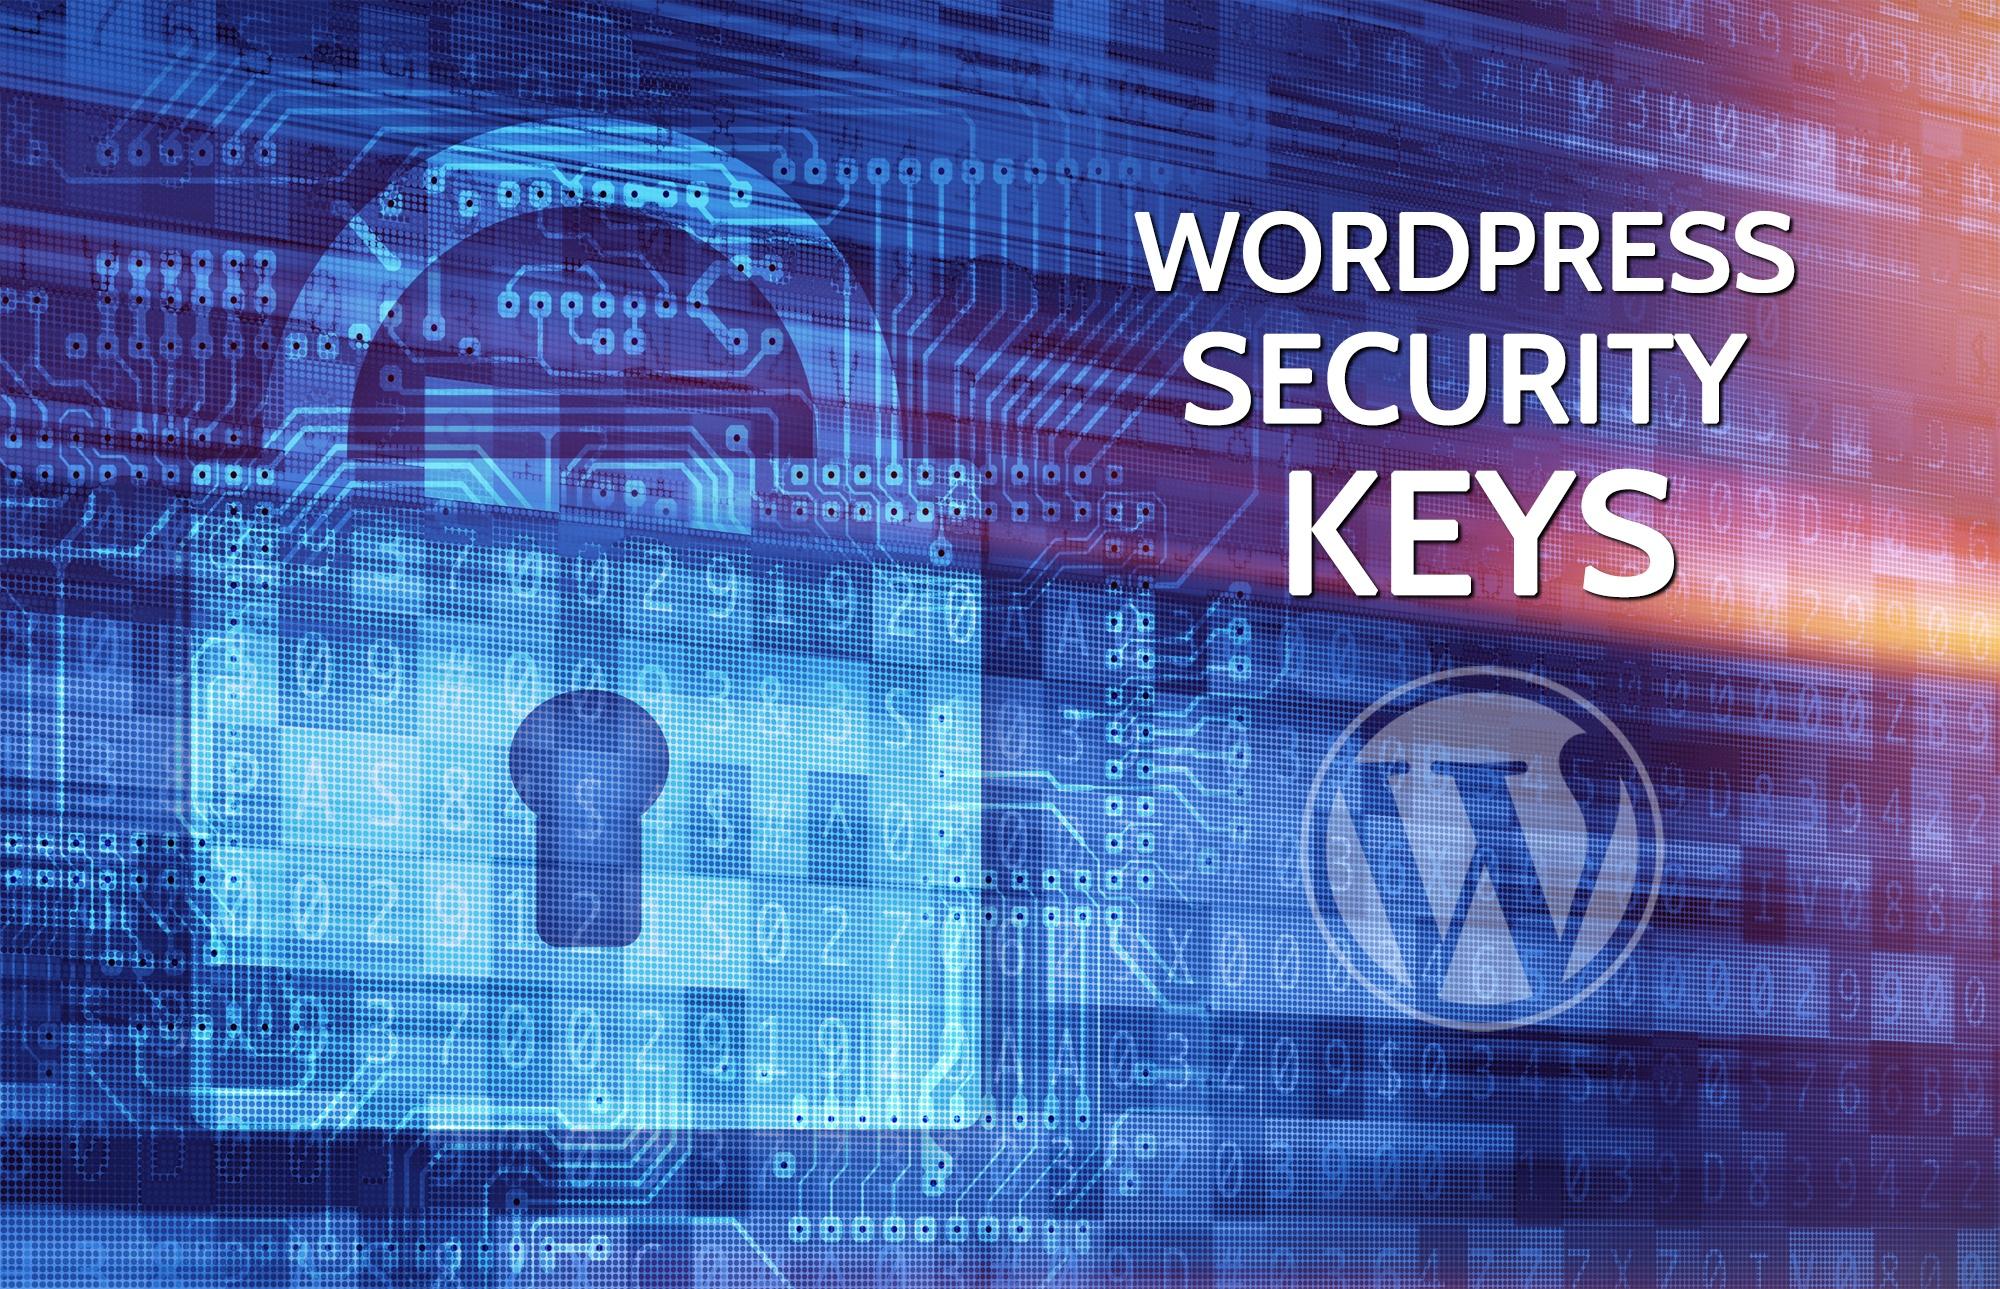 WordPress Security Keys Image